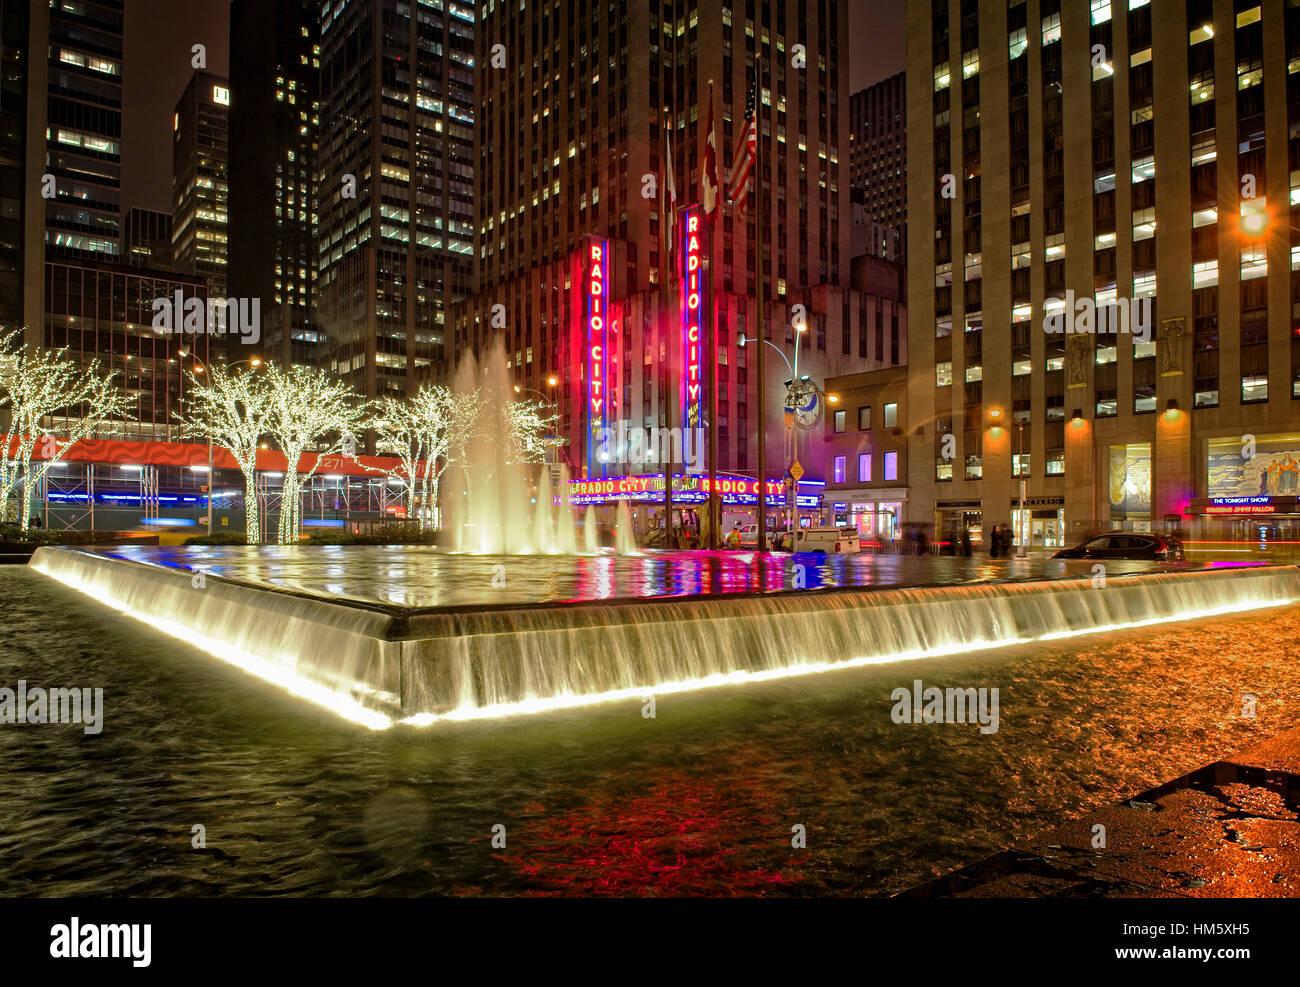 Radio City Music Hall at night - Stock Image